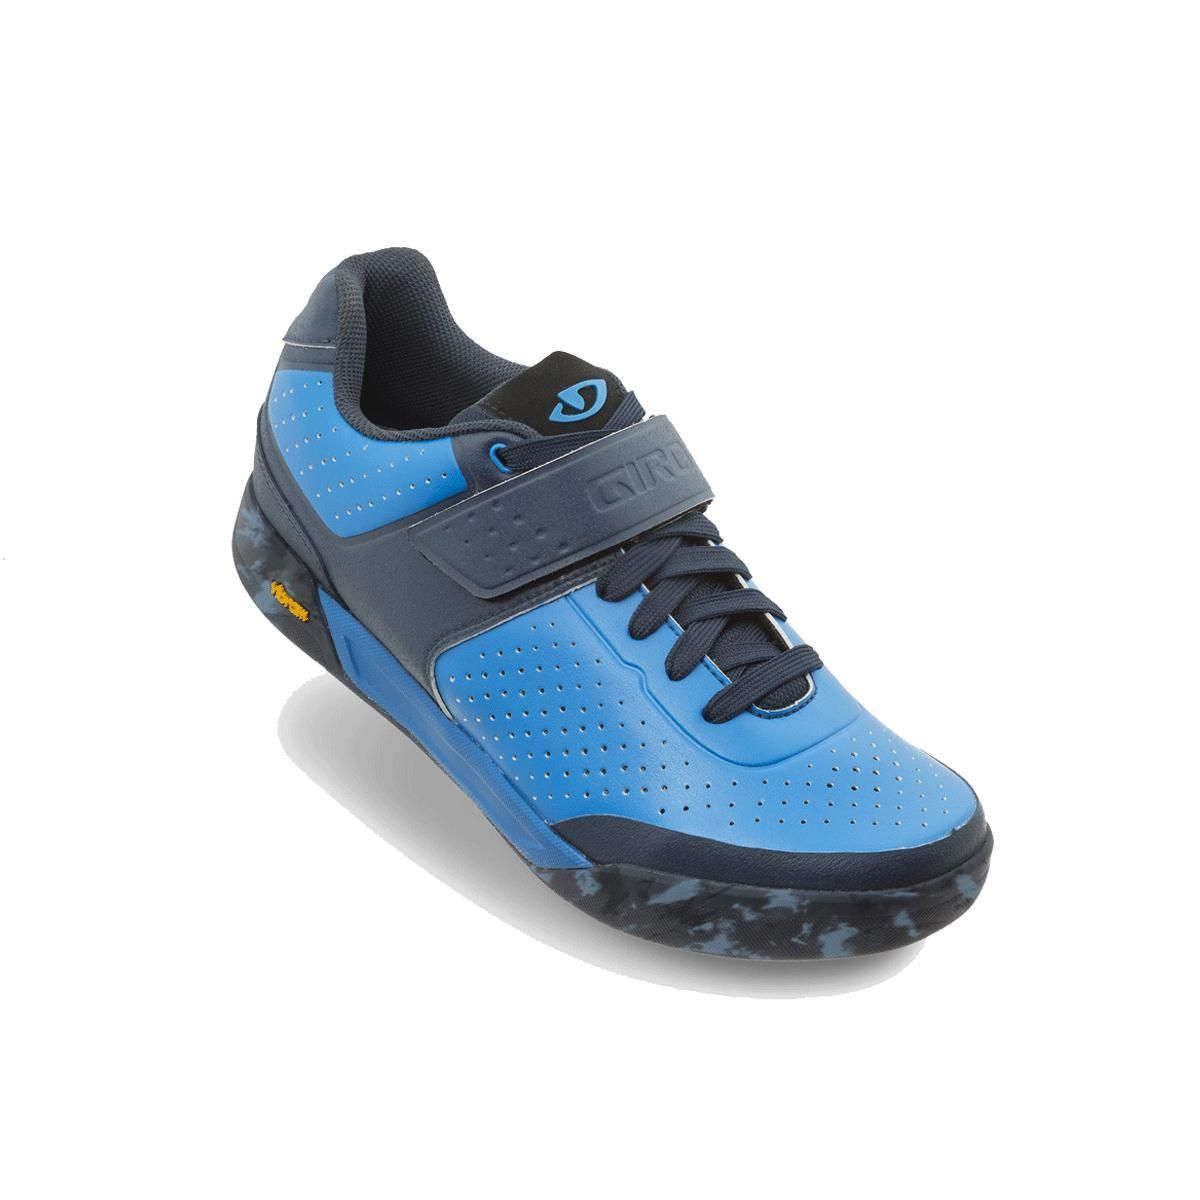 Giro Chamber Ii Mtb Shoes 2018 Blue Jewel Midnight 45 Rugged